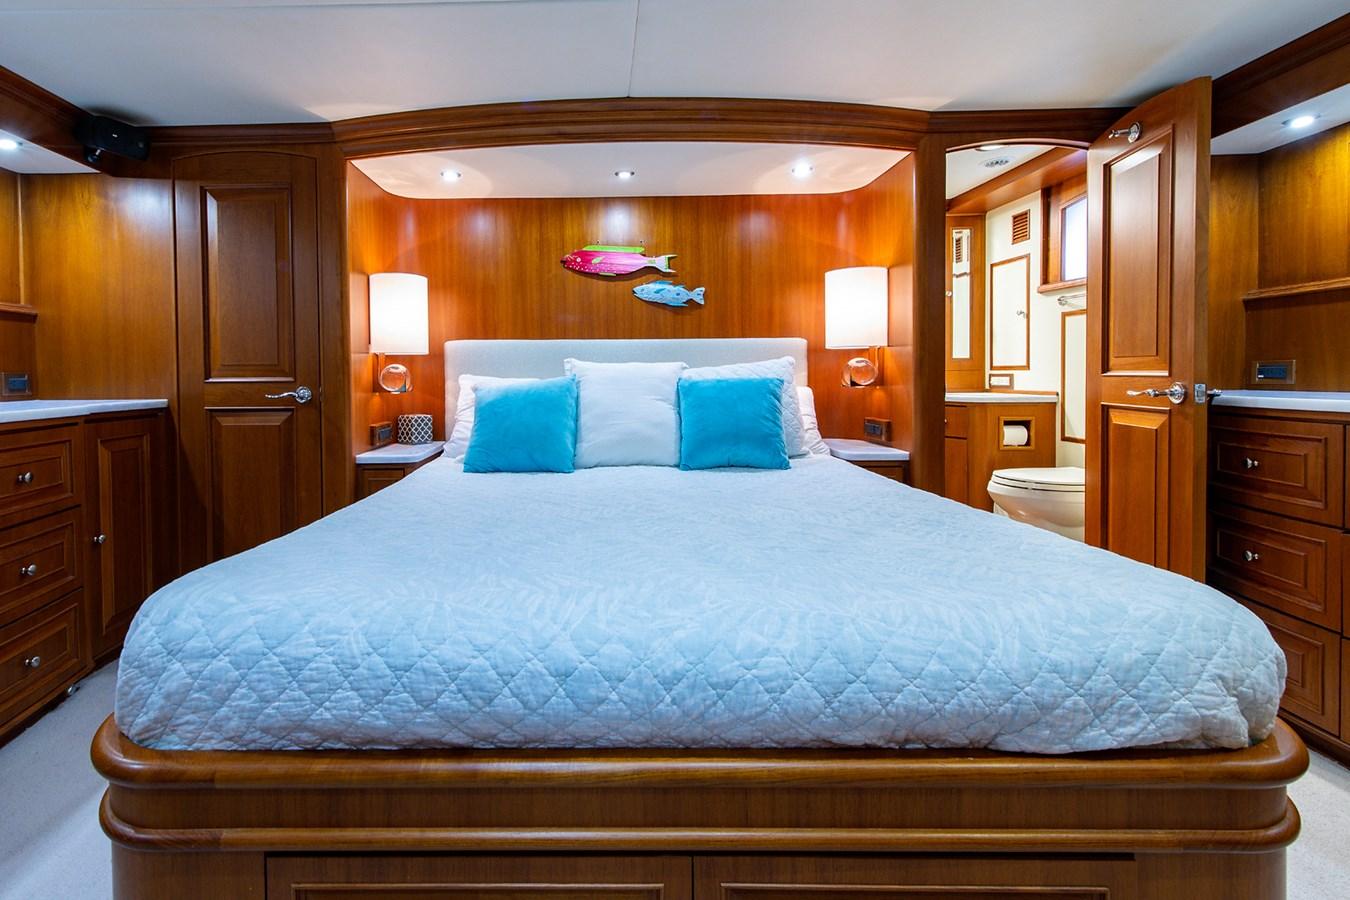 Tout Va Bien_Master Stateroom1 2005 GRAND BANKS 64 Aleutian RP Motor Yacht 2726134